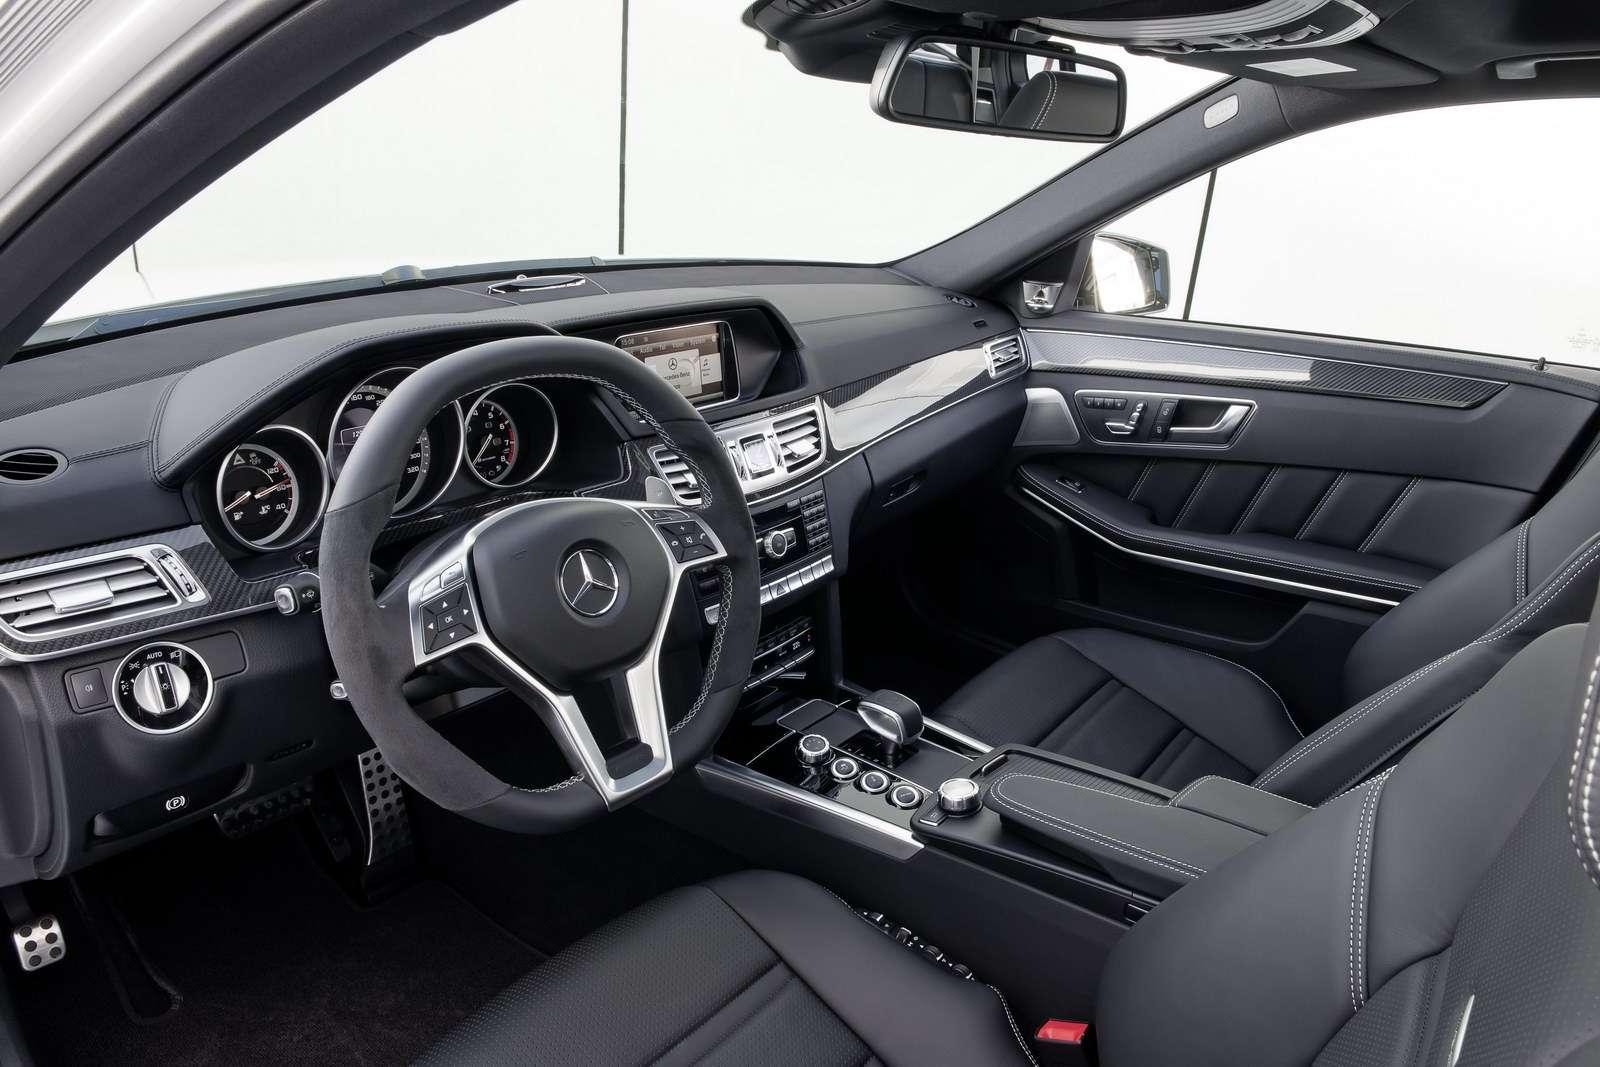 Mercedes E63 AMG 2013